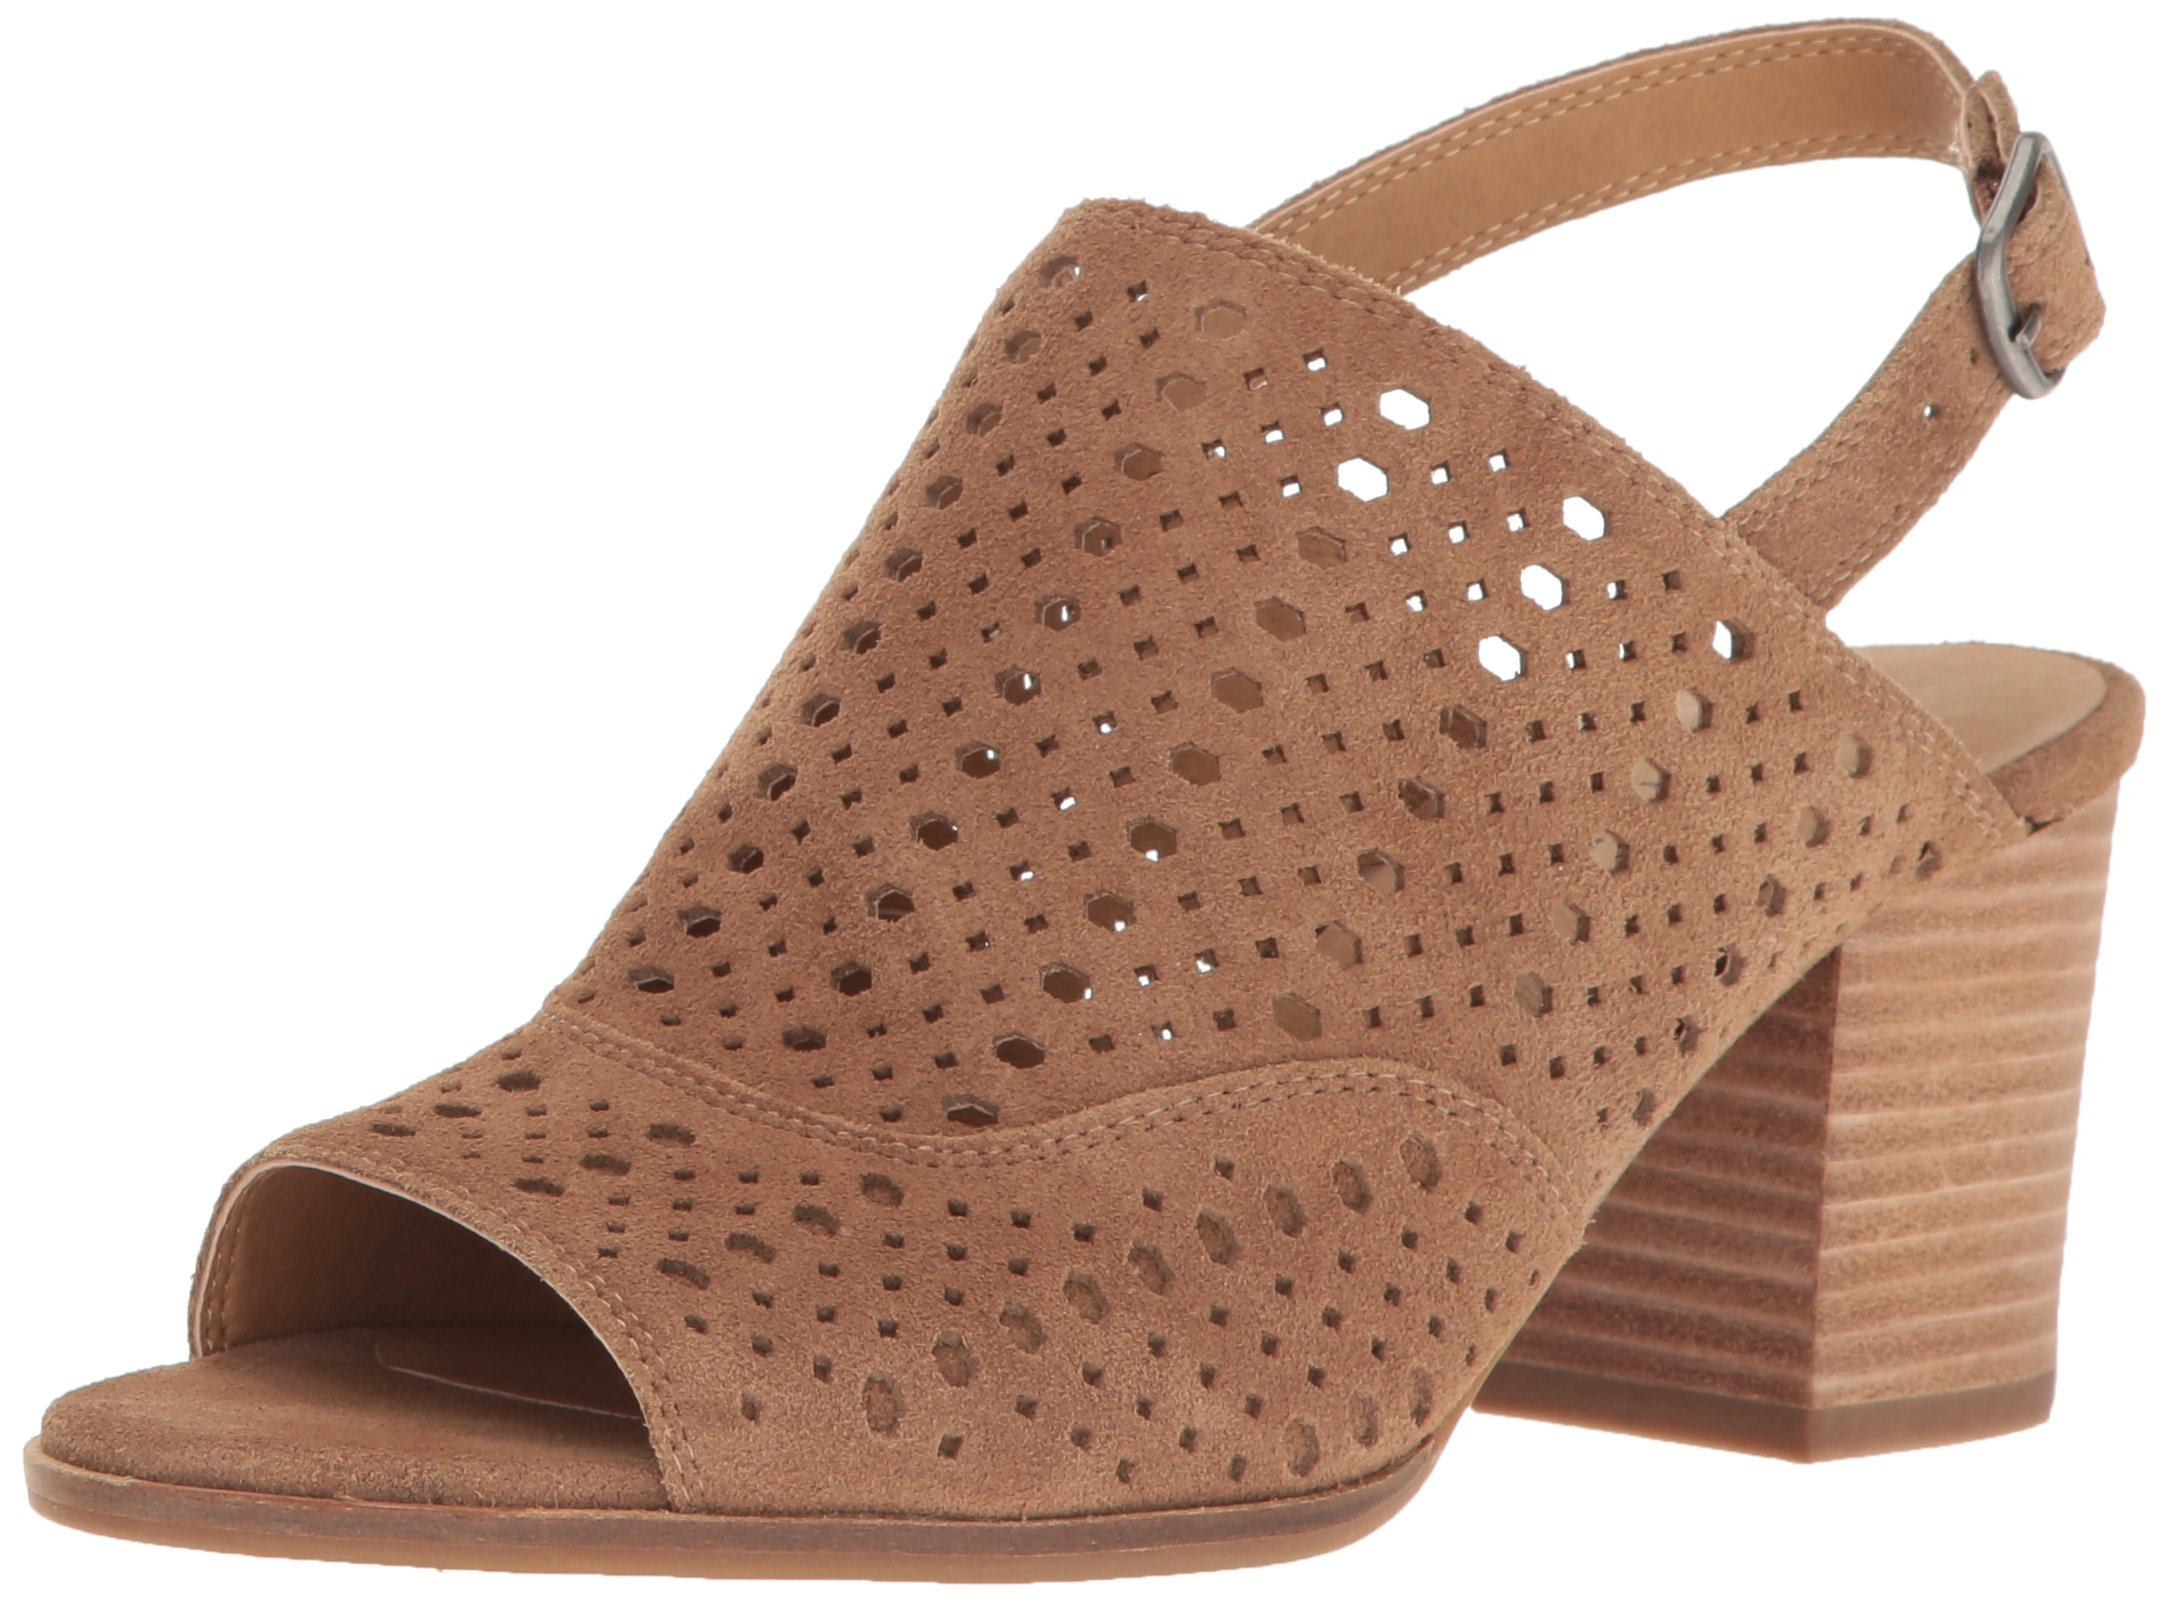 Lucky Women's LK-Ortiza Dress Sandal, Sesame, 9.5 M US